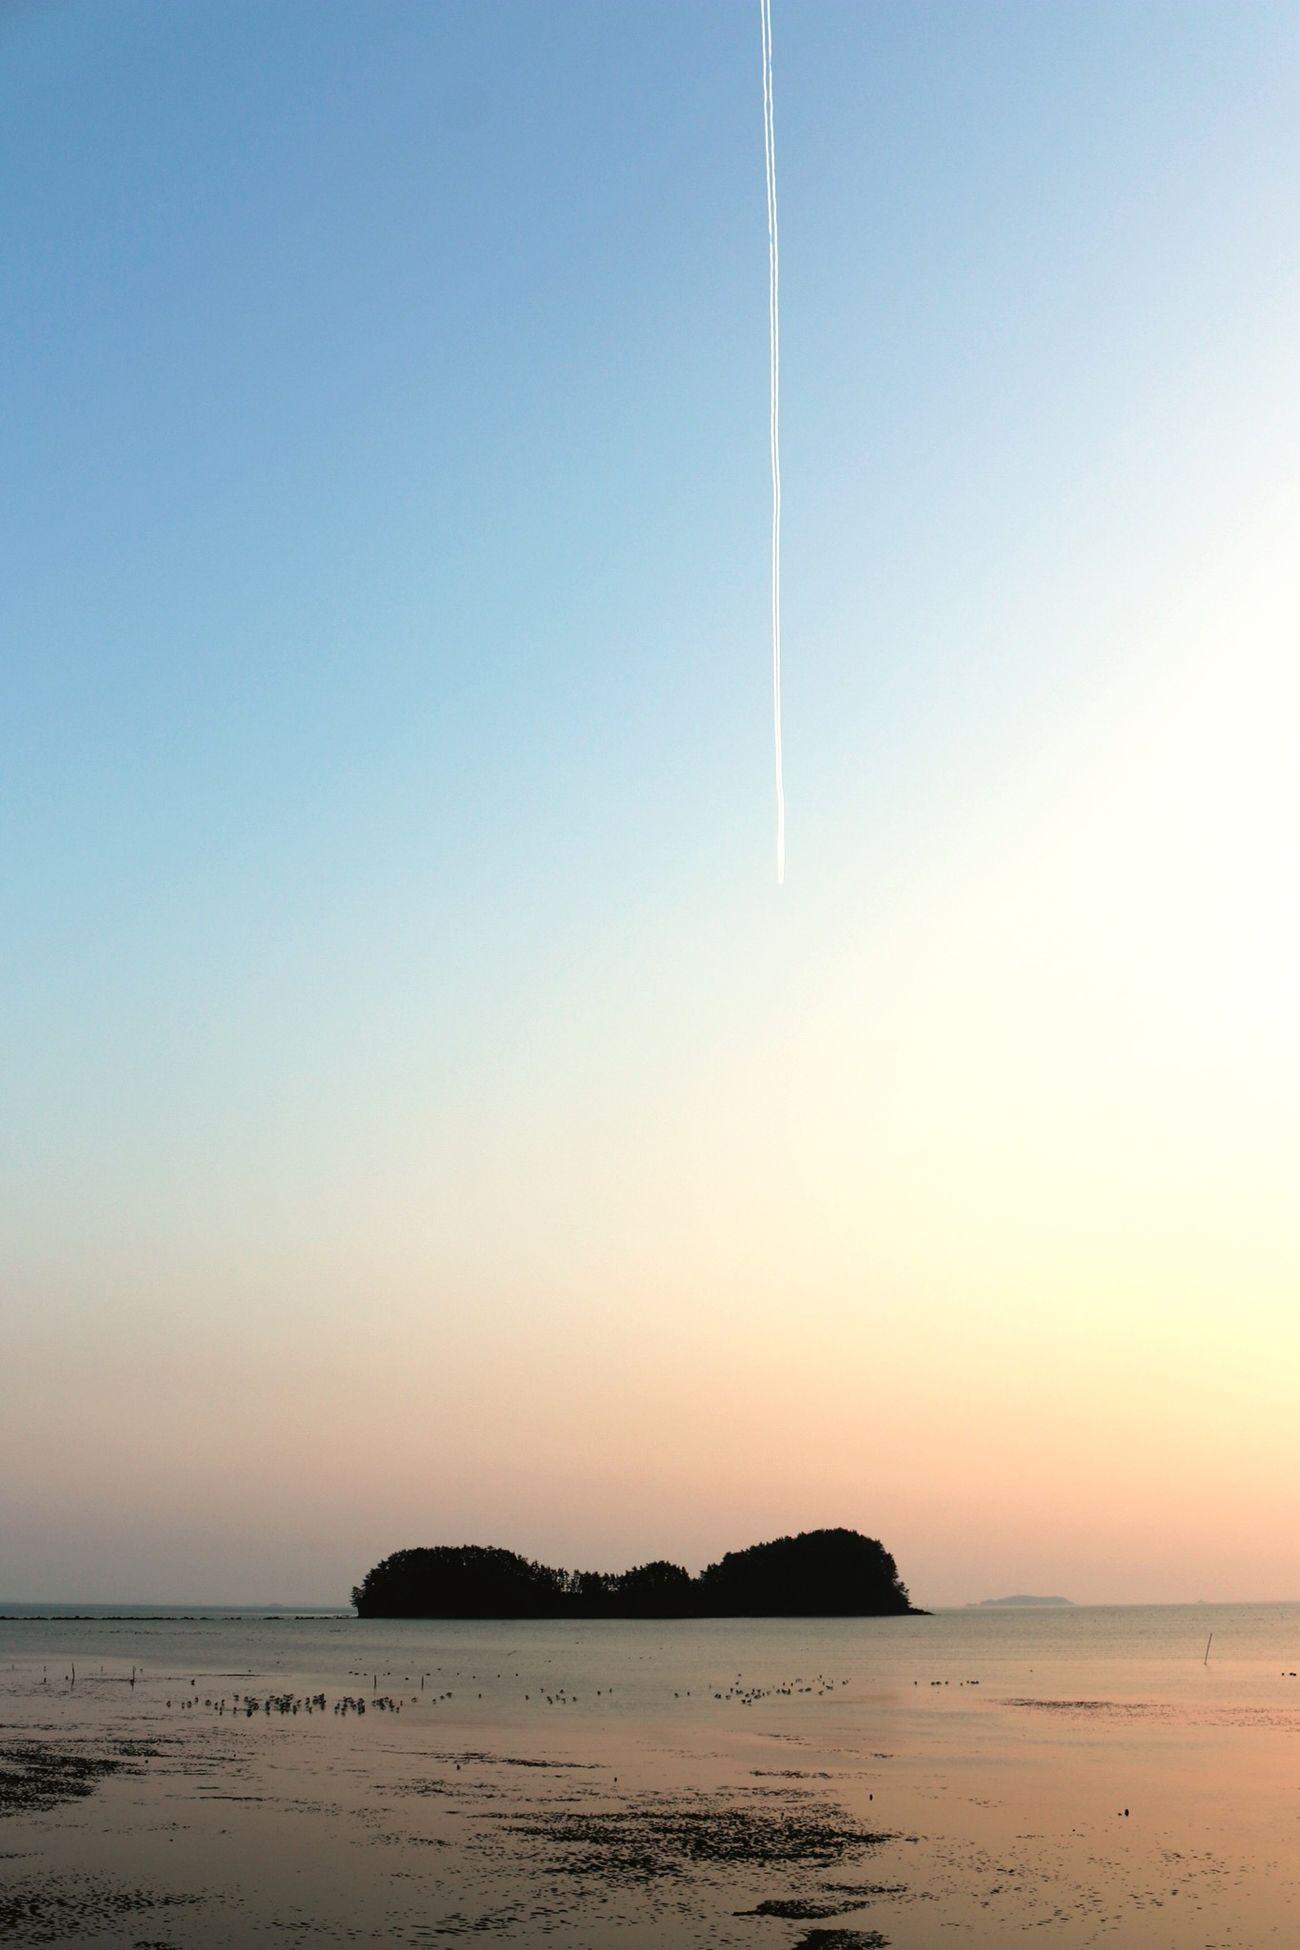 Sea Sky Leave Vapor Trail Behind Shooting Star Mud Flats 비행운이 별똥별 떨어지는 것 같이 찍혔다!